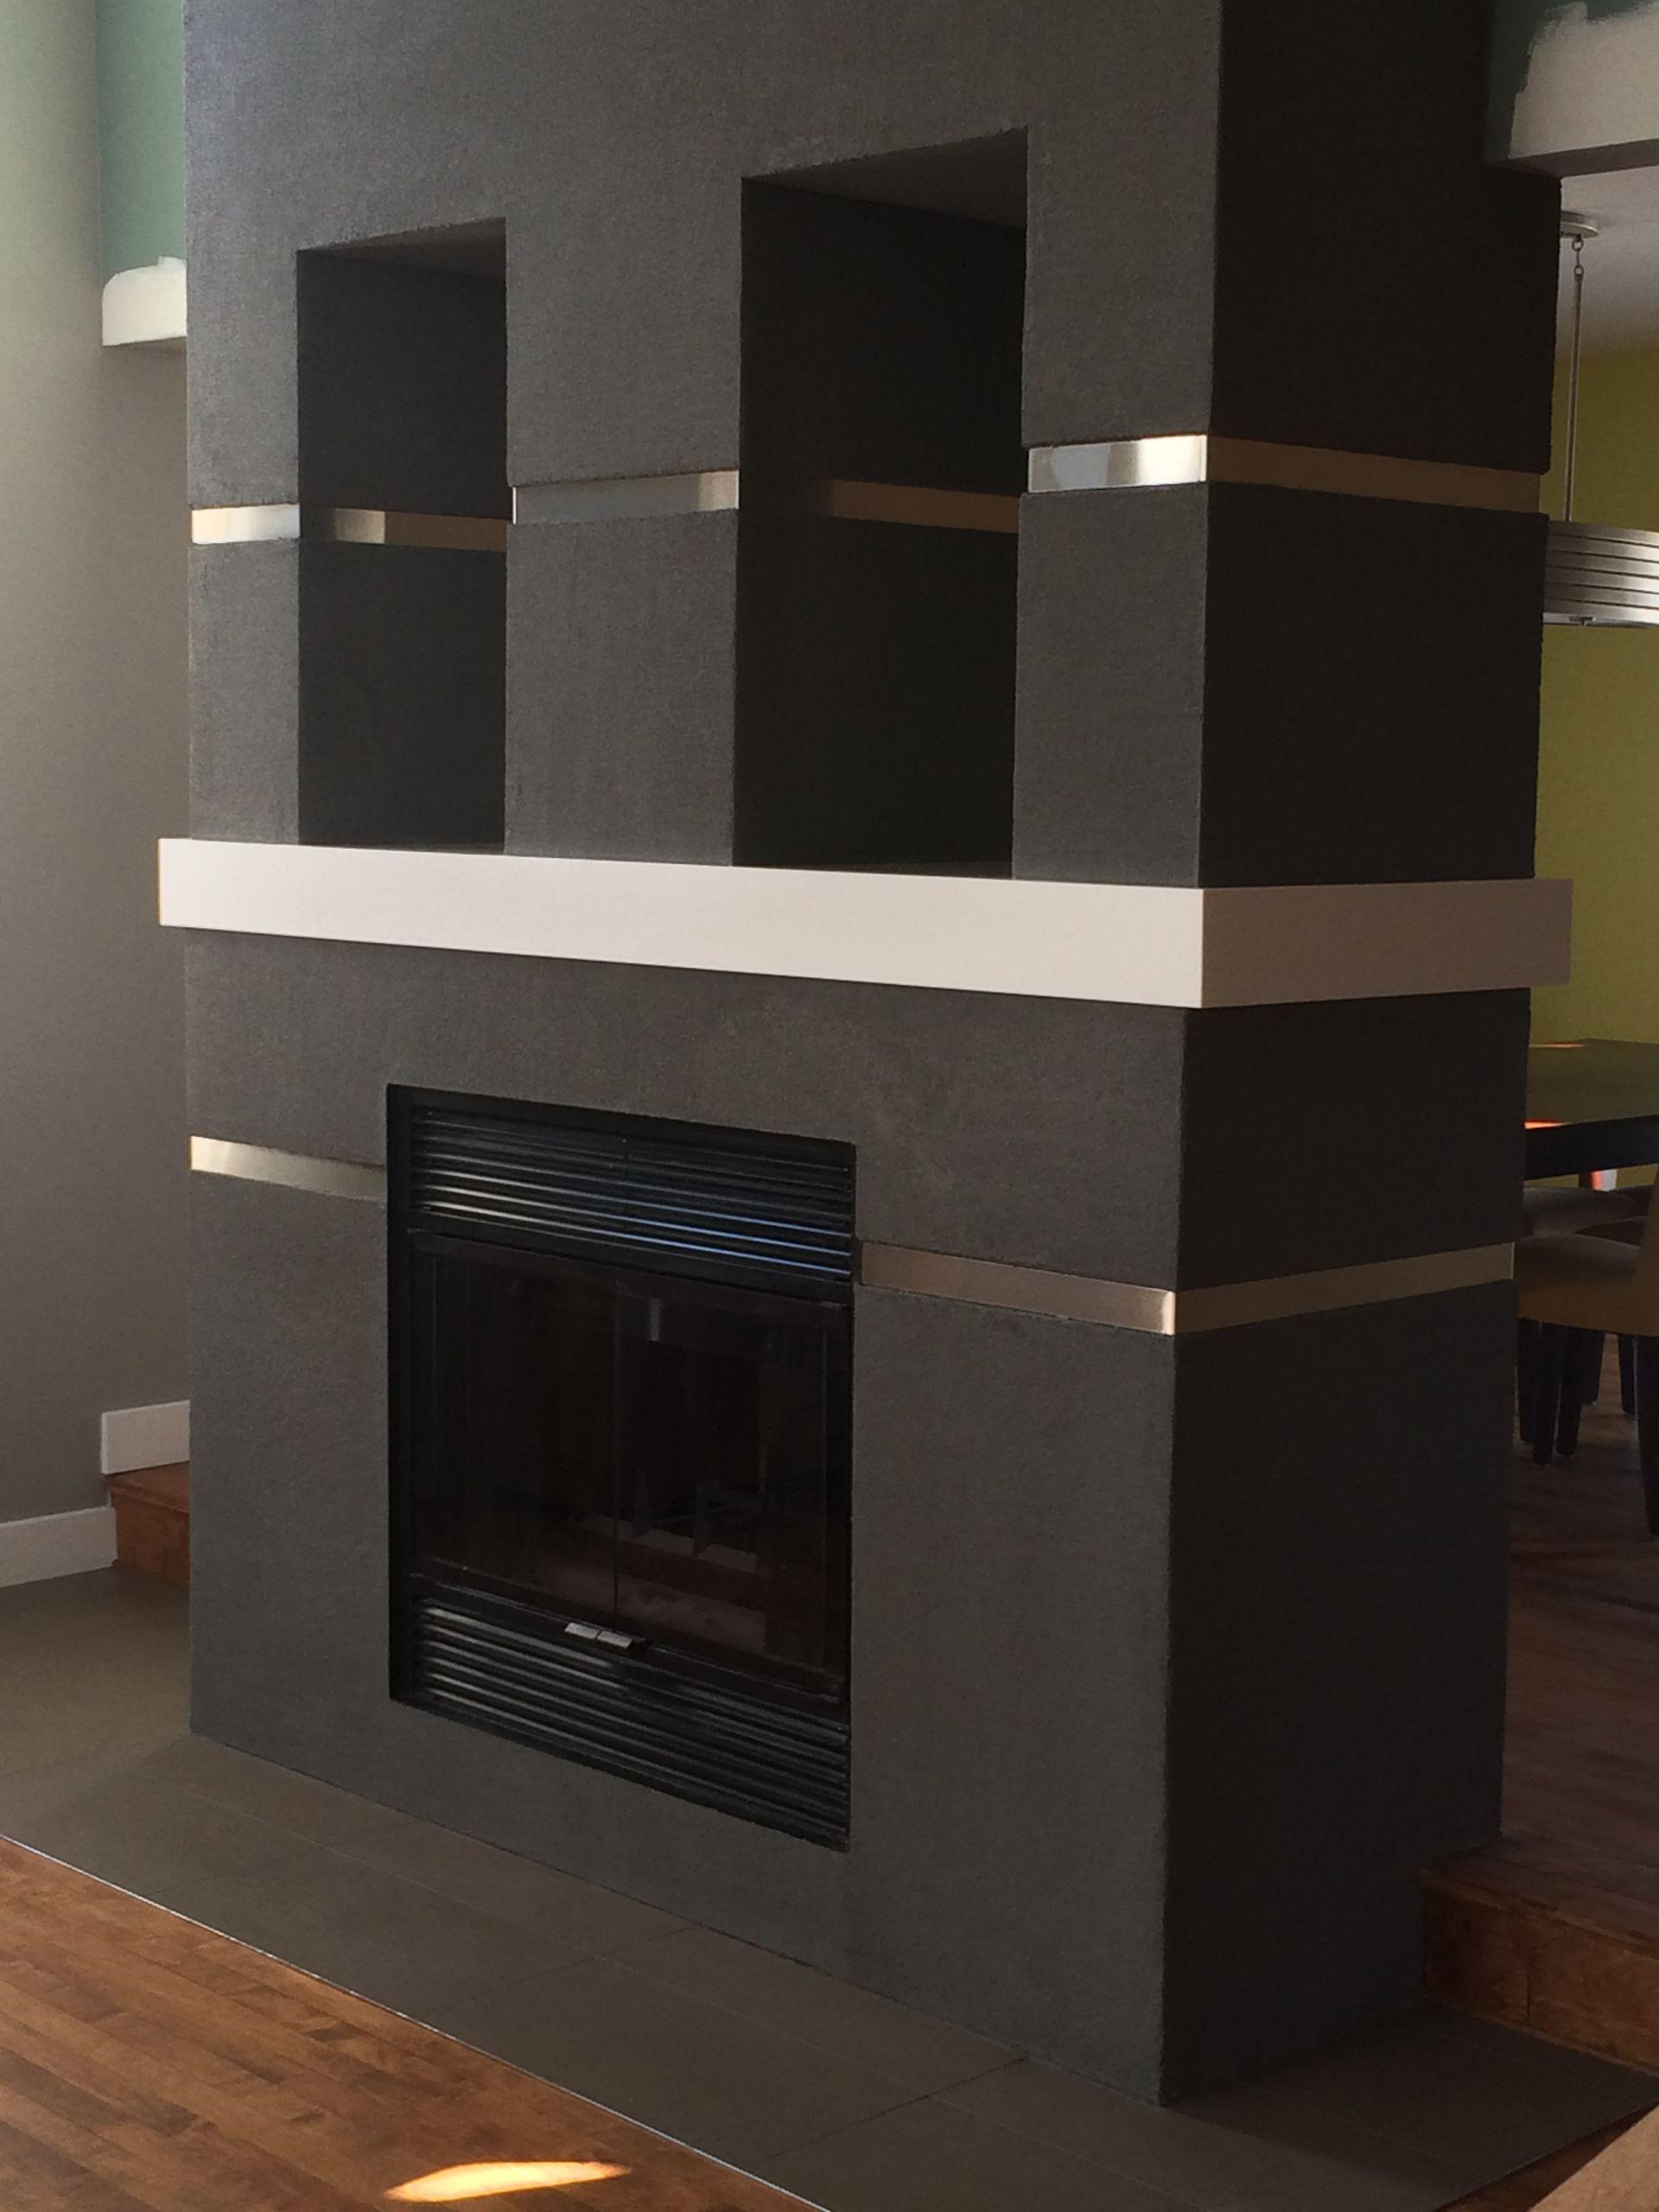 Nos r alisations michel legault r novation - Construction cheminee interieure ...